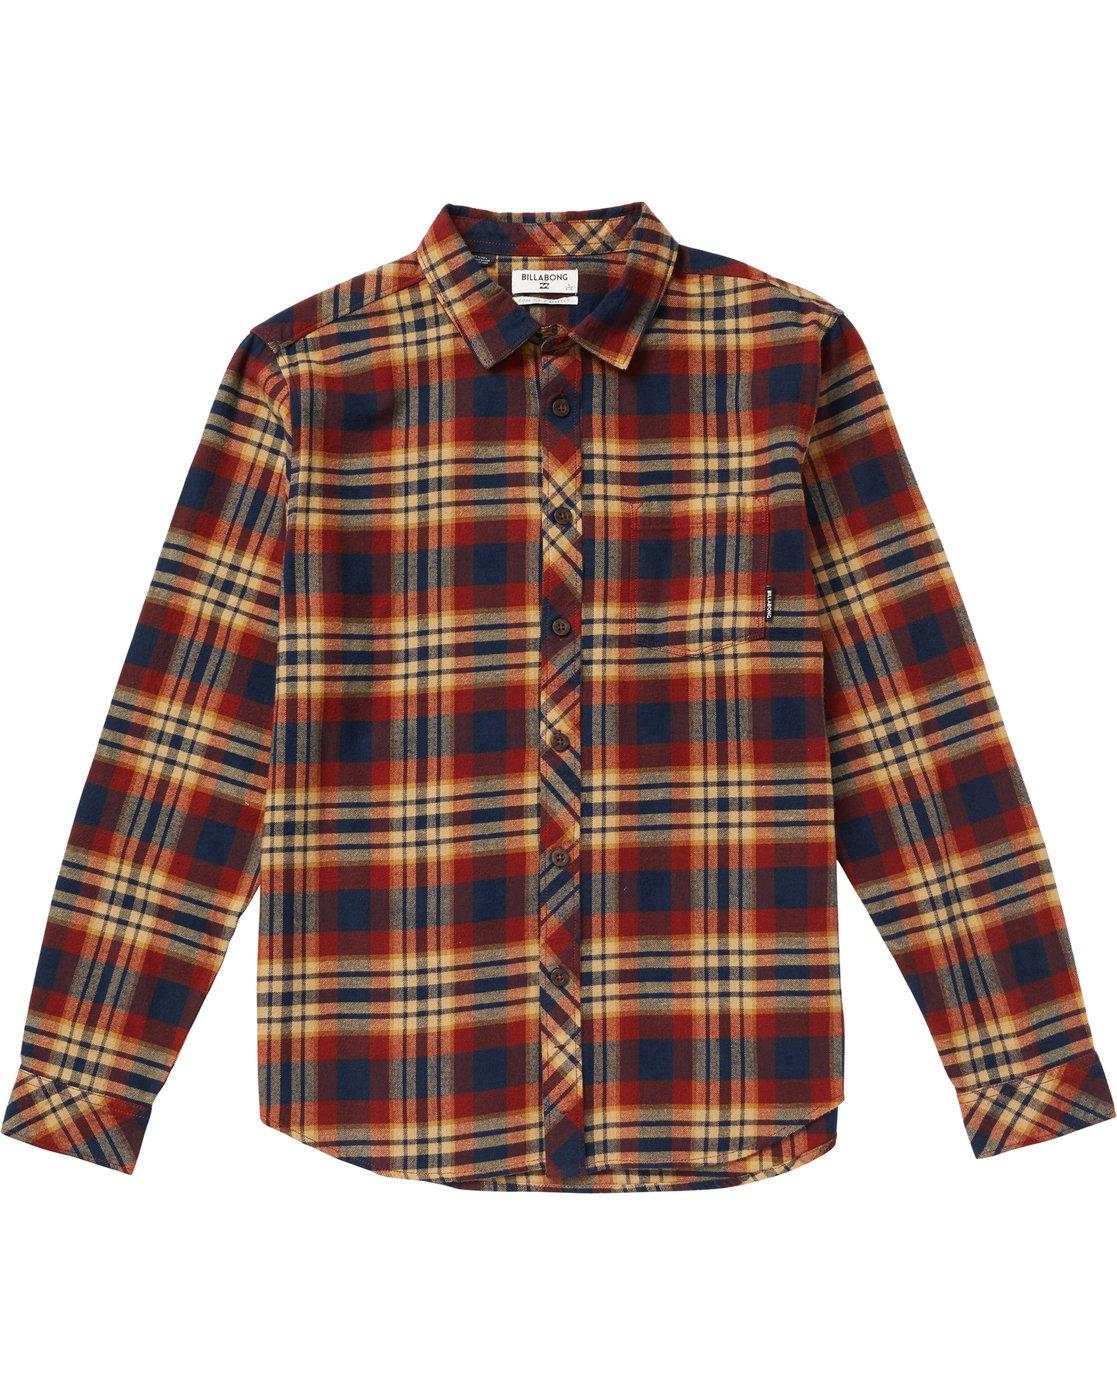 05aa4305e 0 Boys' Coastline Plaid Flannel Shirt Grey B532SBCO Billabong